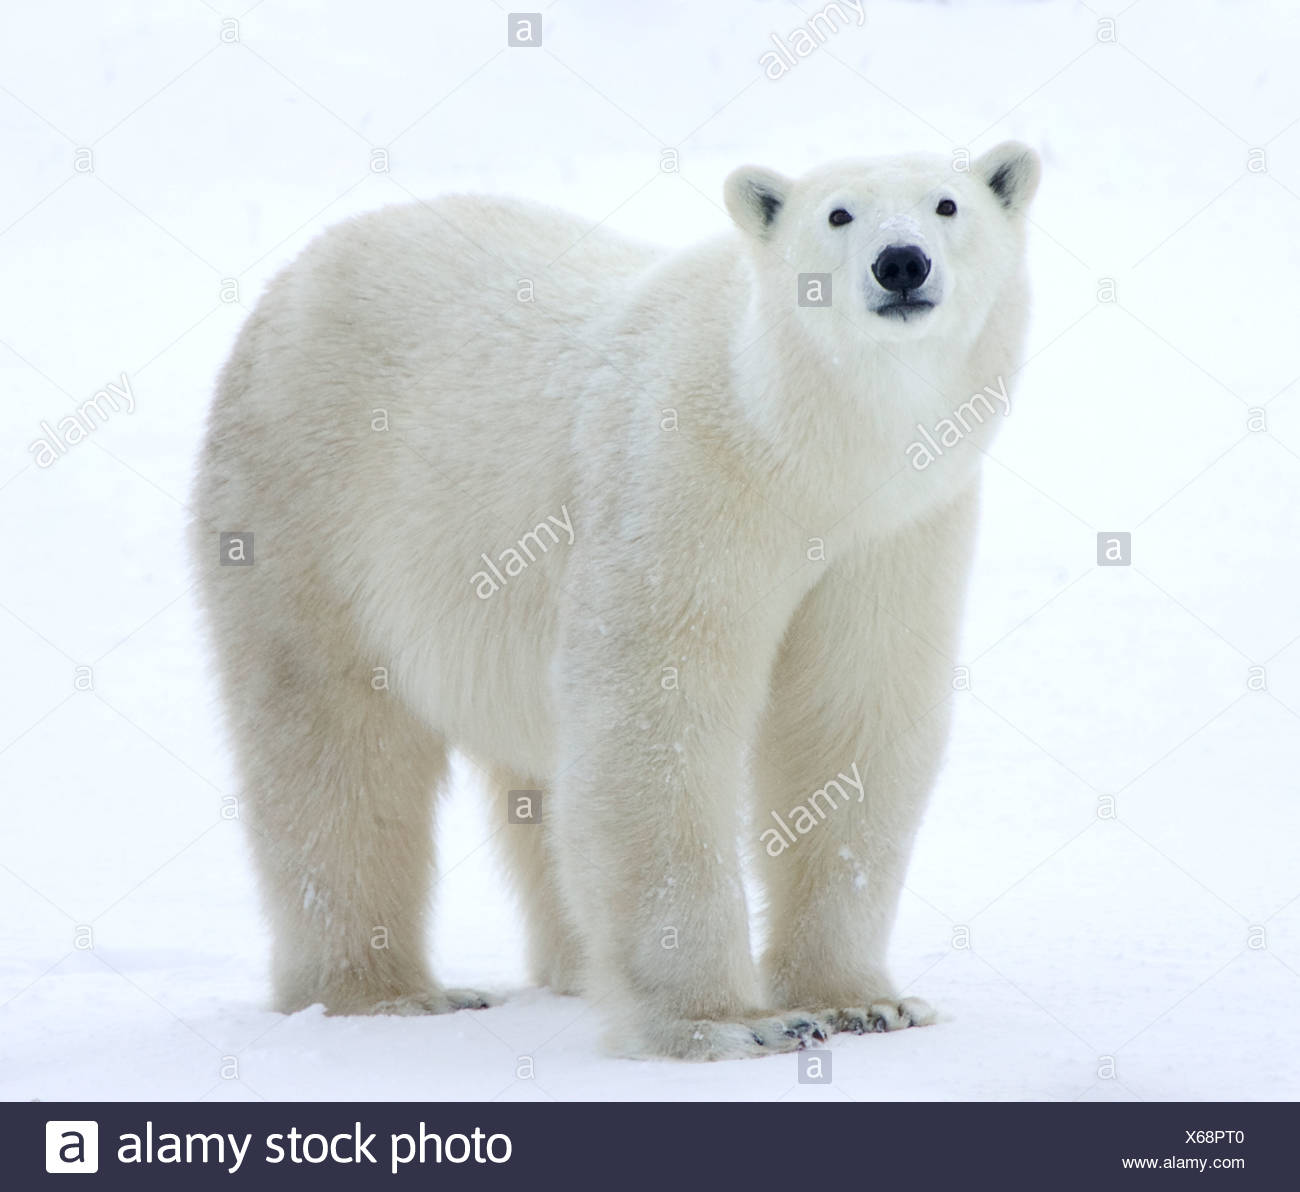 Polar bear standing in field - Stock Image